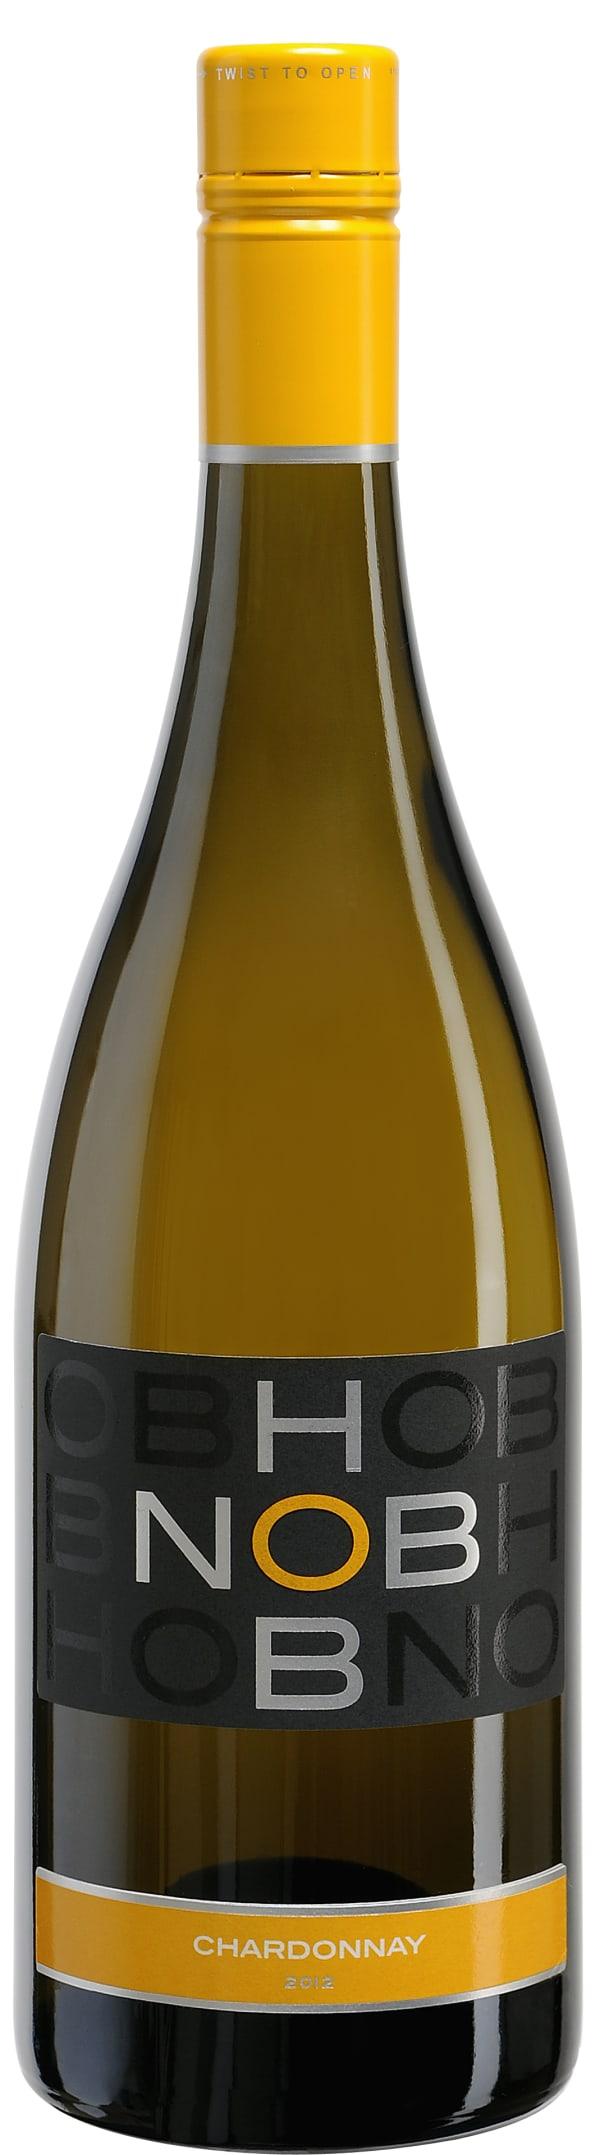 Hob Nob Chardonnay 2014